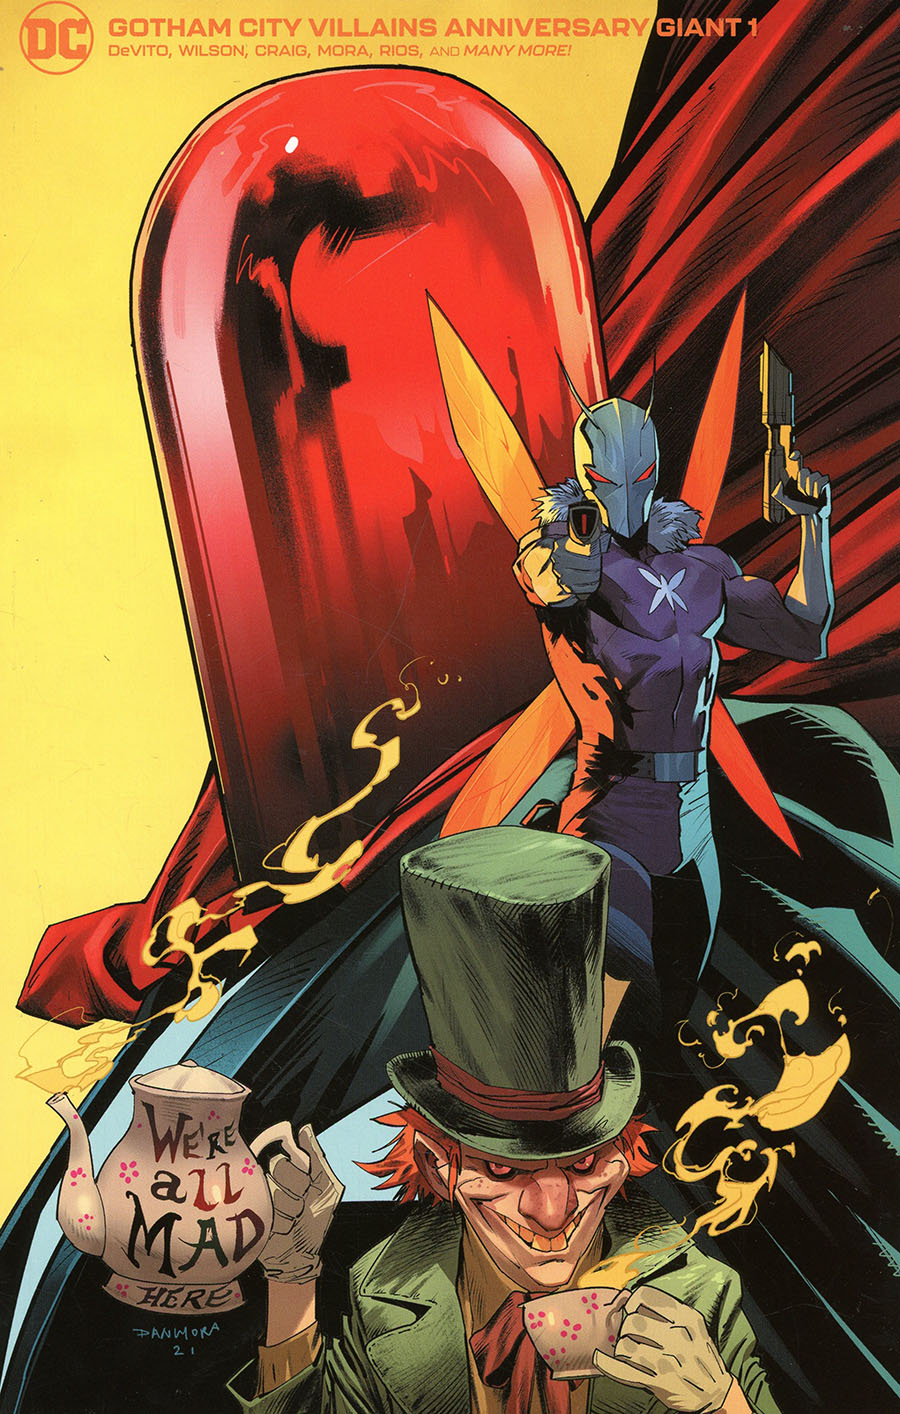 Gotham City Villains Anniversary Giant #1 (One Shot) Cover F Variant Dan Mora Mad Hatter Killer Moth Red Hood Card Stock Cover